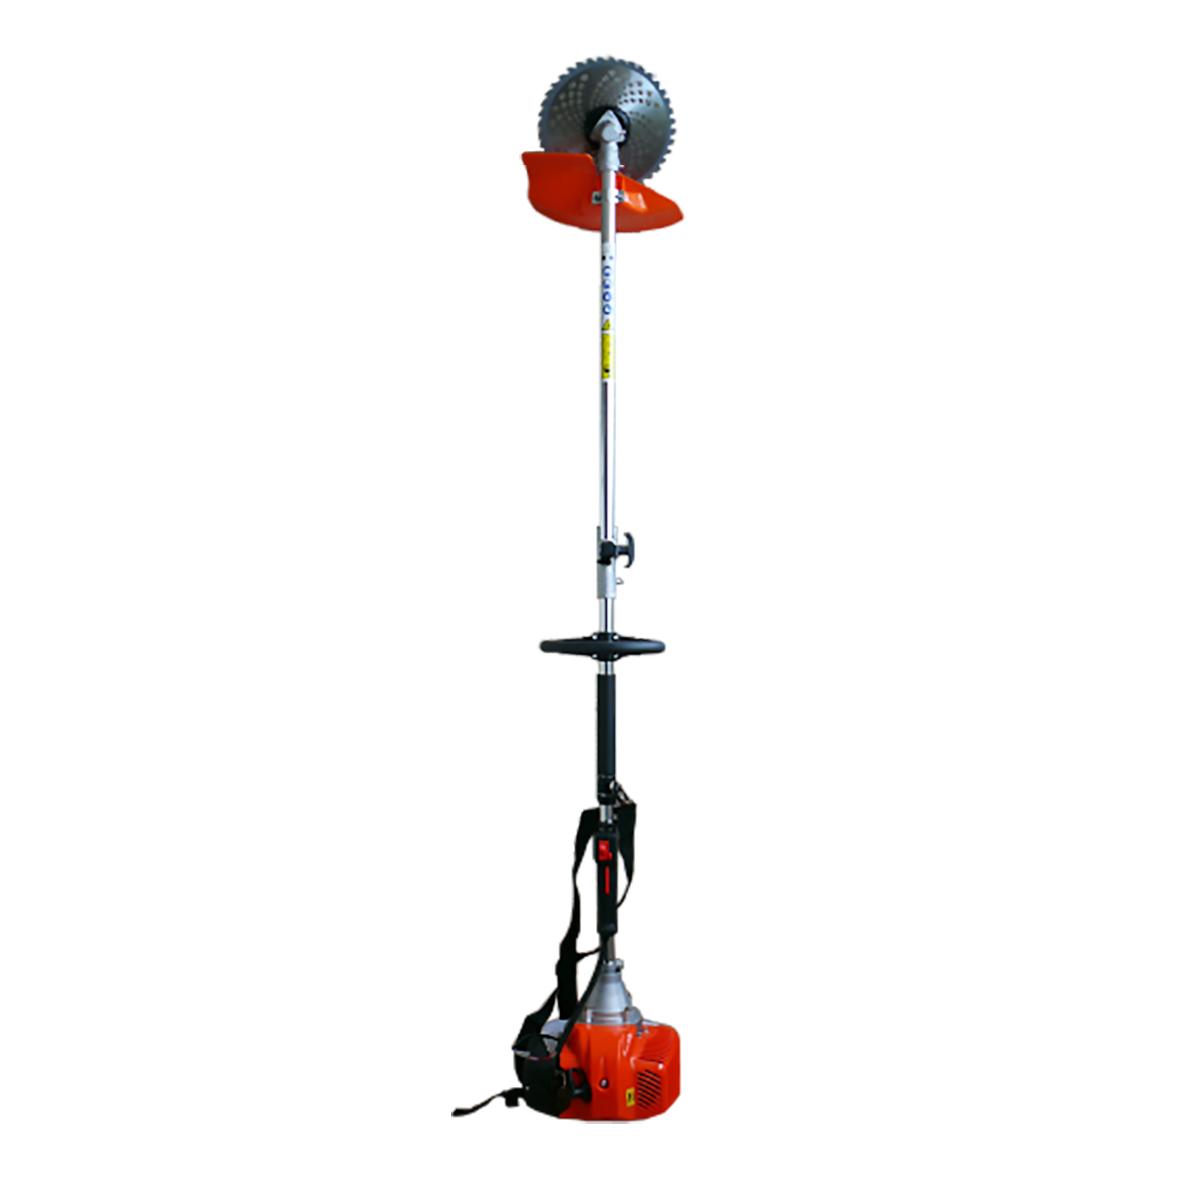 ExectFamiliar 多様式草刈り機 Ex-33msk-2 肩掛け式 2スト 33cc